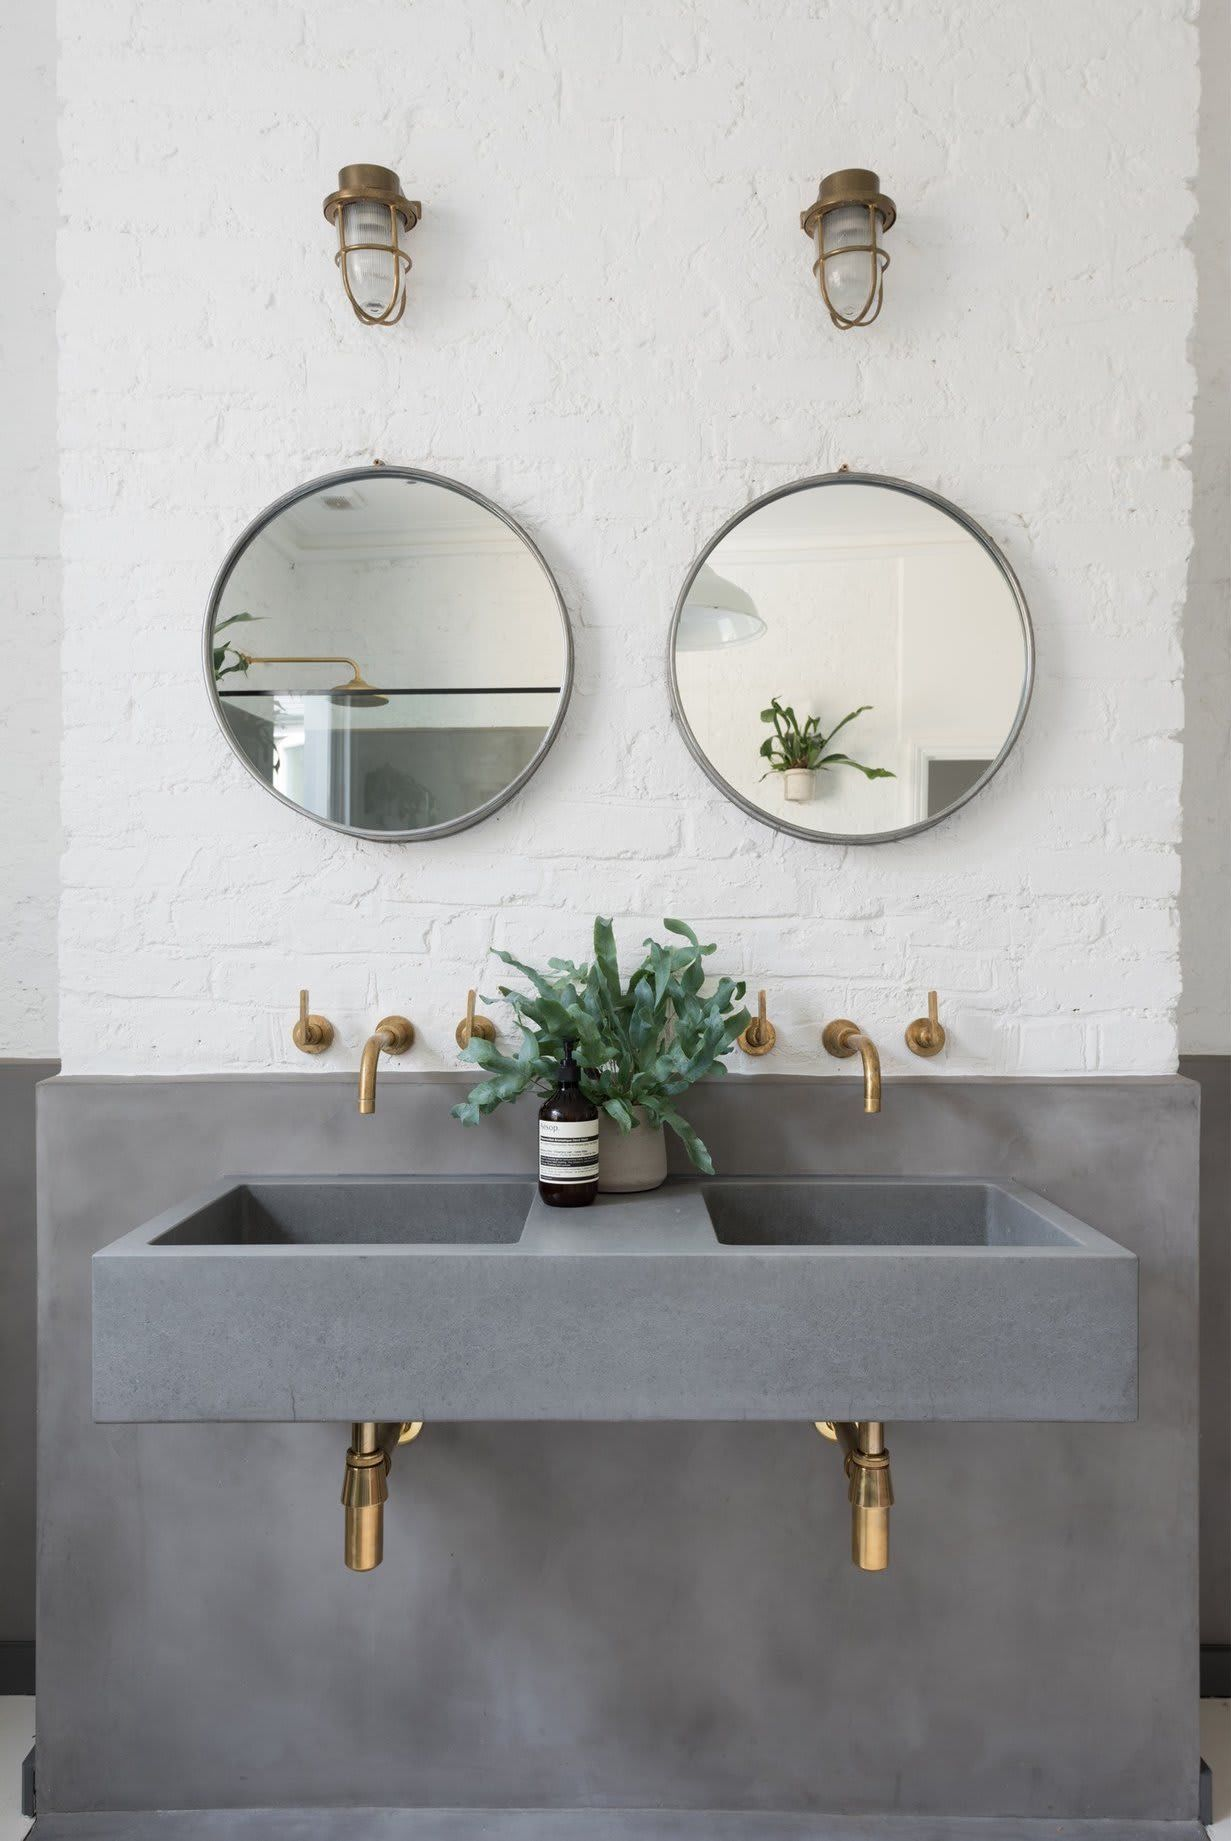 8 Double Sink Vanity Ideas That Ll Inspire You To Upgrade Your Bathroom Top Bathroom Design Concrete Bathroom Master Bathroom Design [ 1841 x 1231 Pixel ]